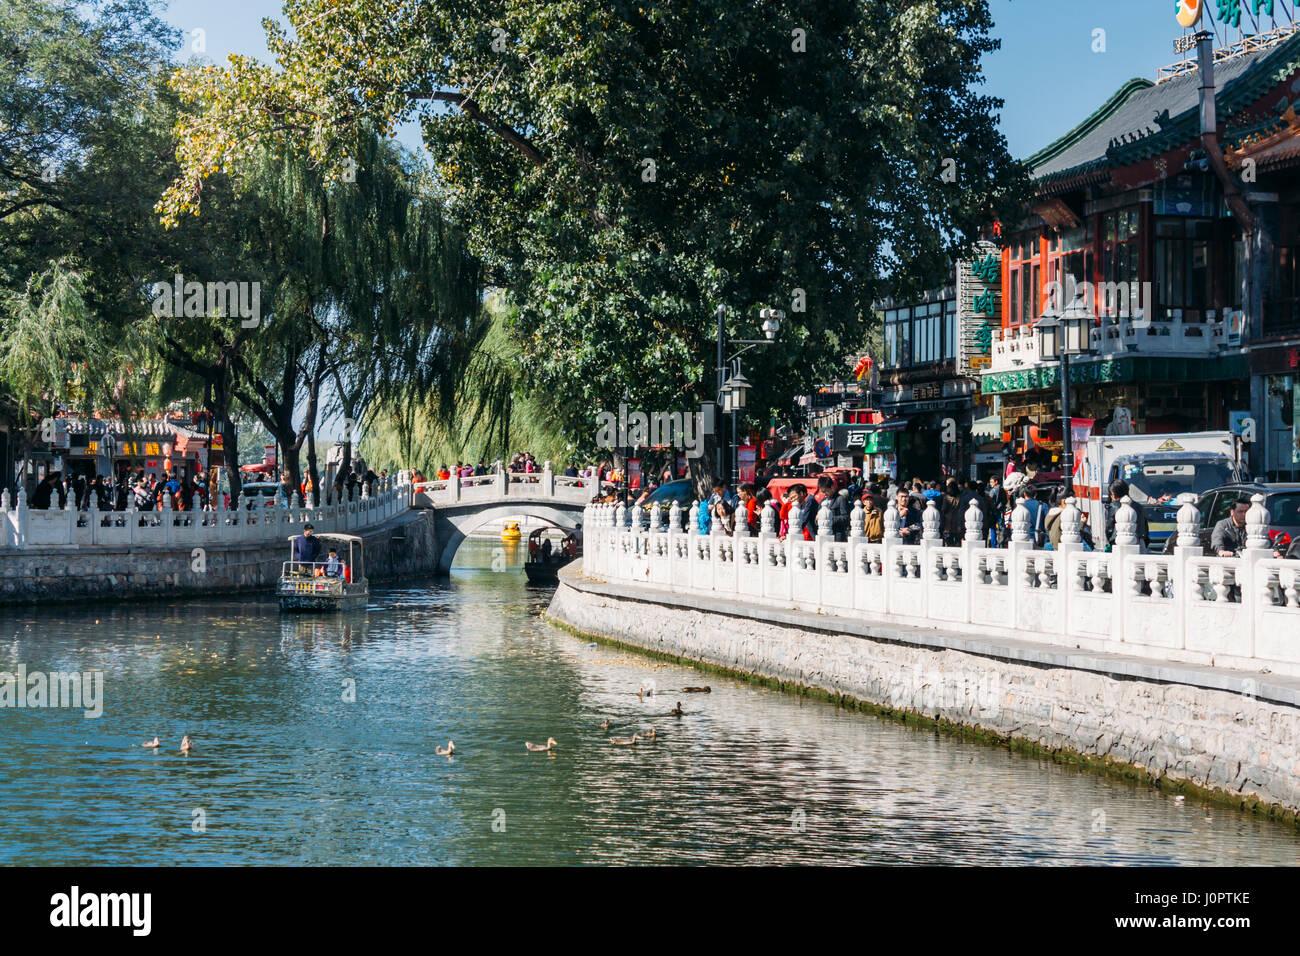 25,October 2014 -In Beijing ShiChaHai. Boats and bridge on Qianhai lake in Shichahai lake of Beijing China, many - Stock Image